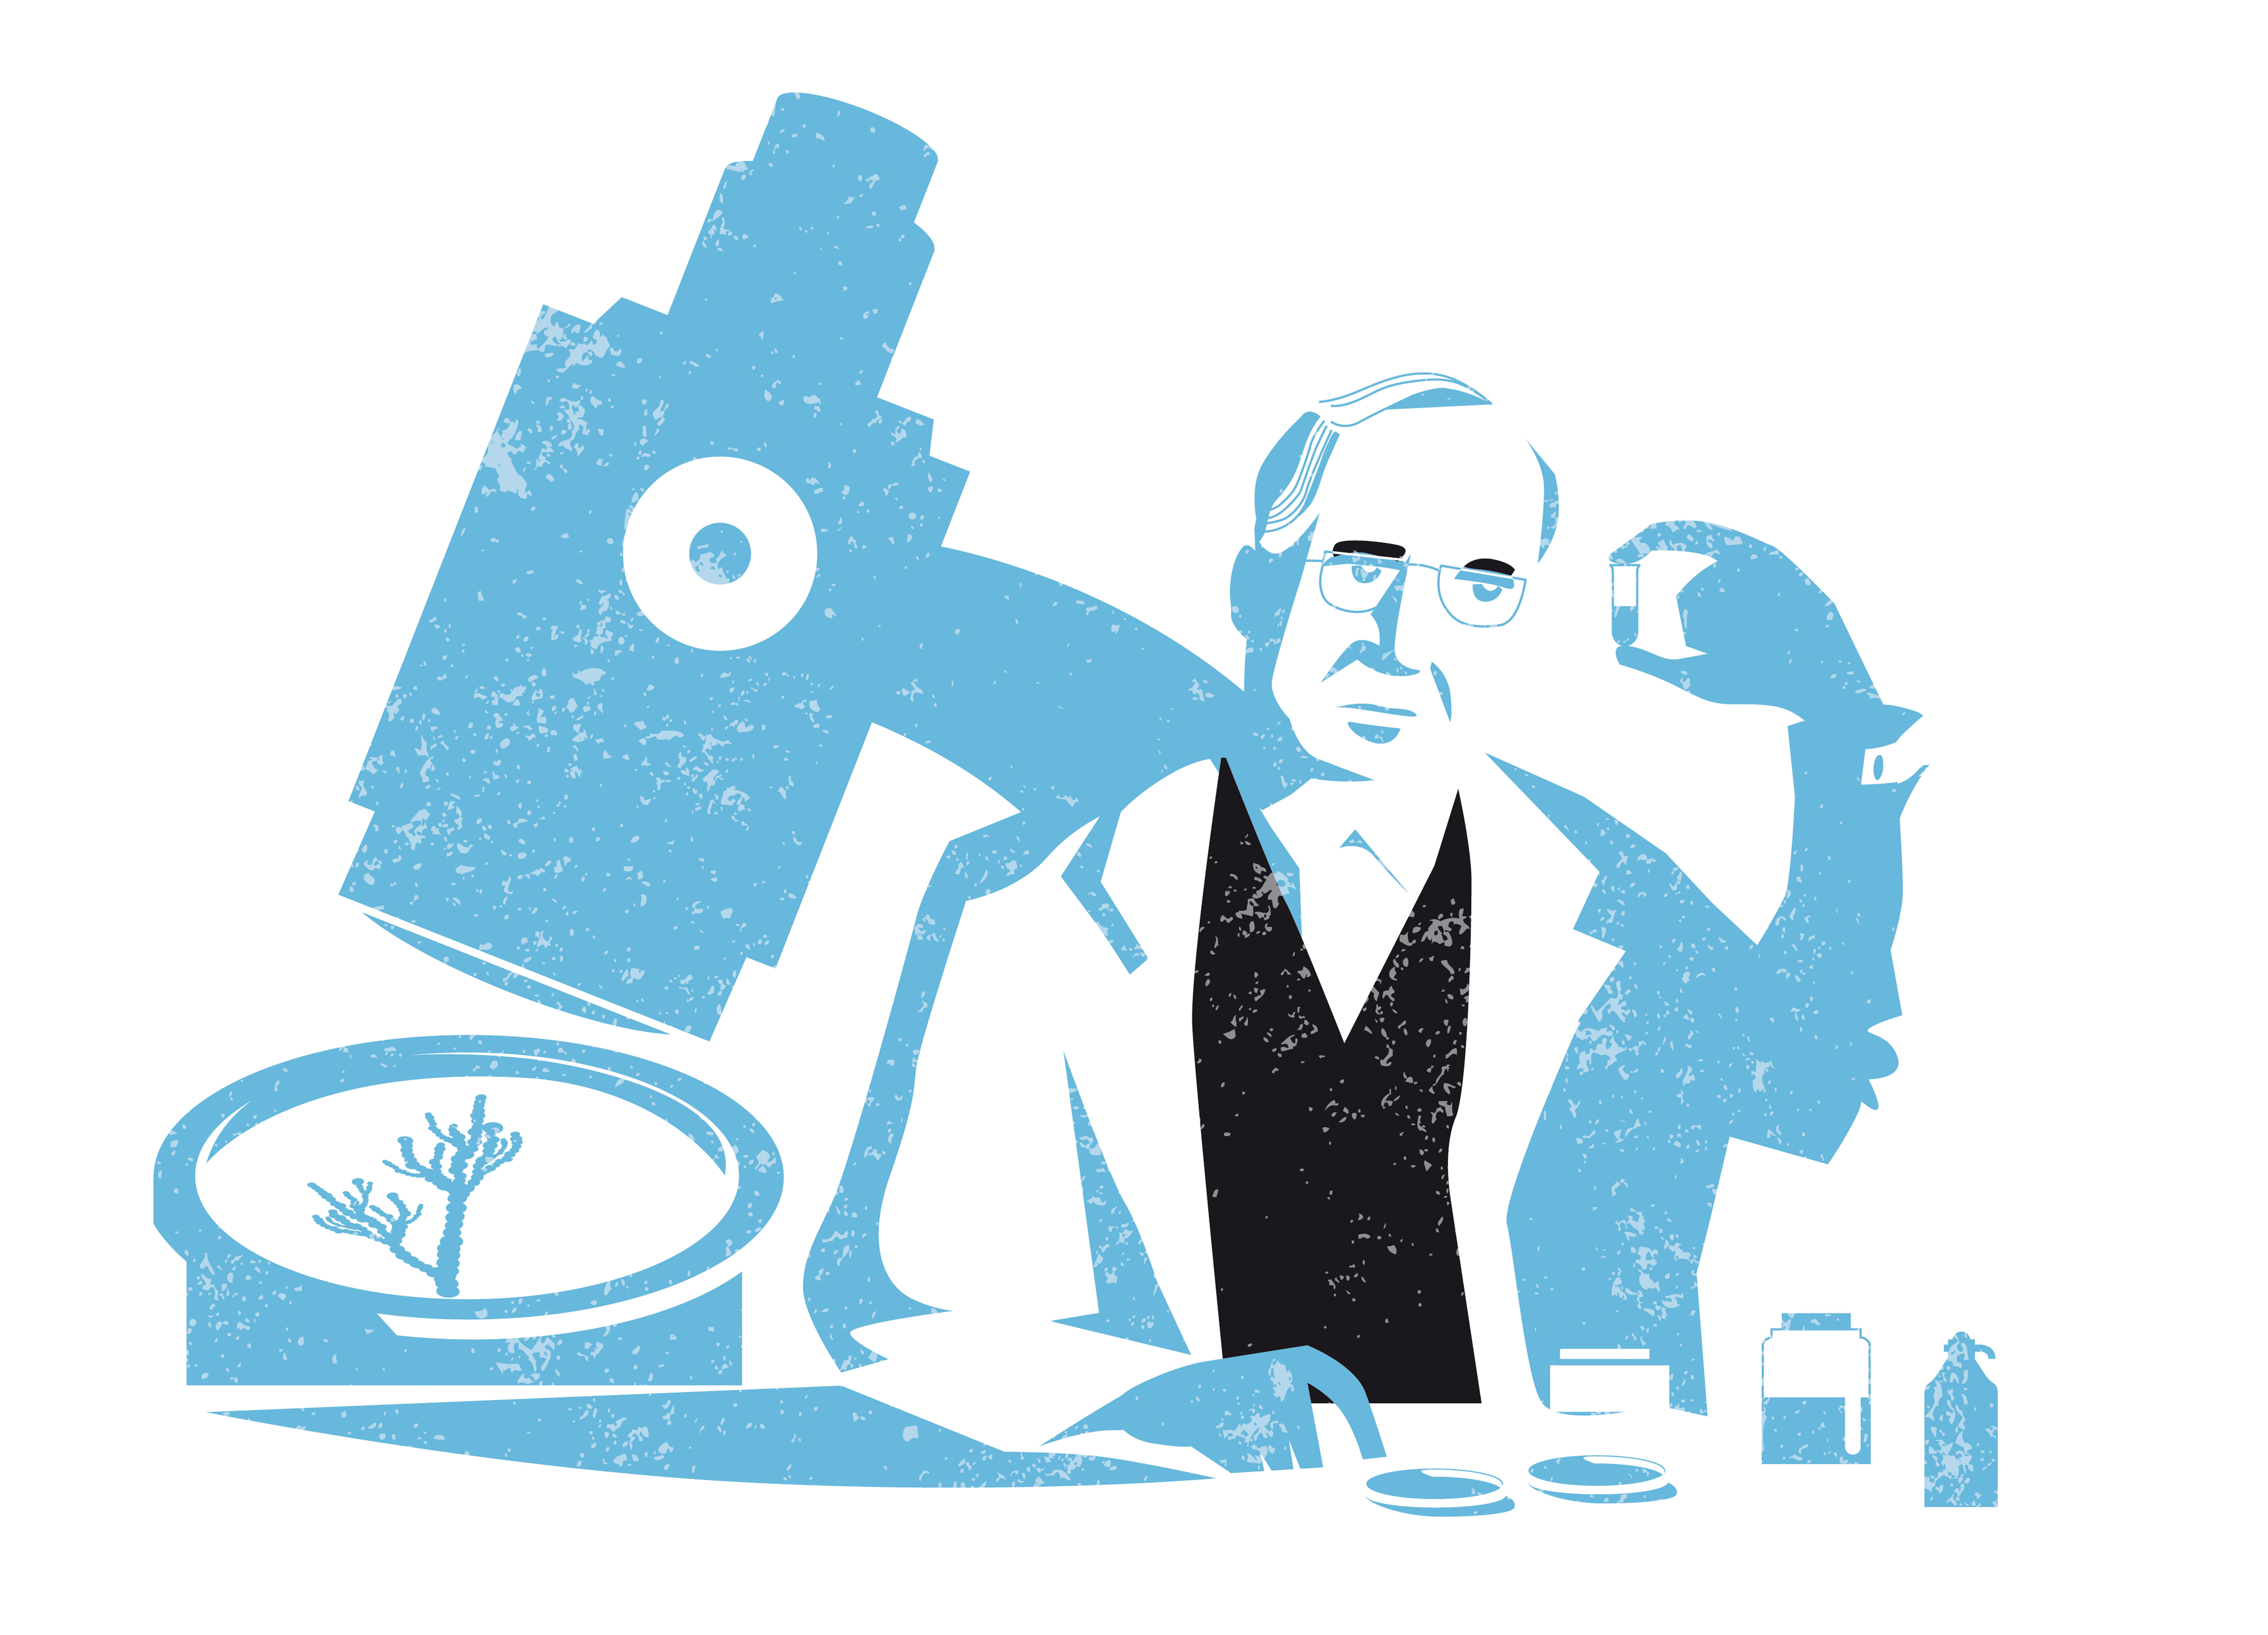 1999 utsåg tidskriften Time Alexander Fleming till en av 1900-talets mest inflytelserika personer